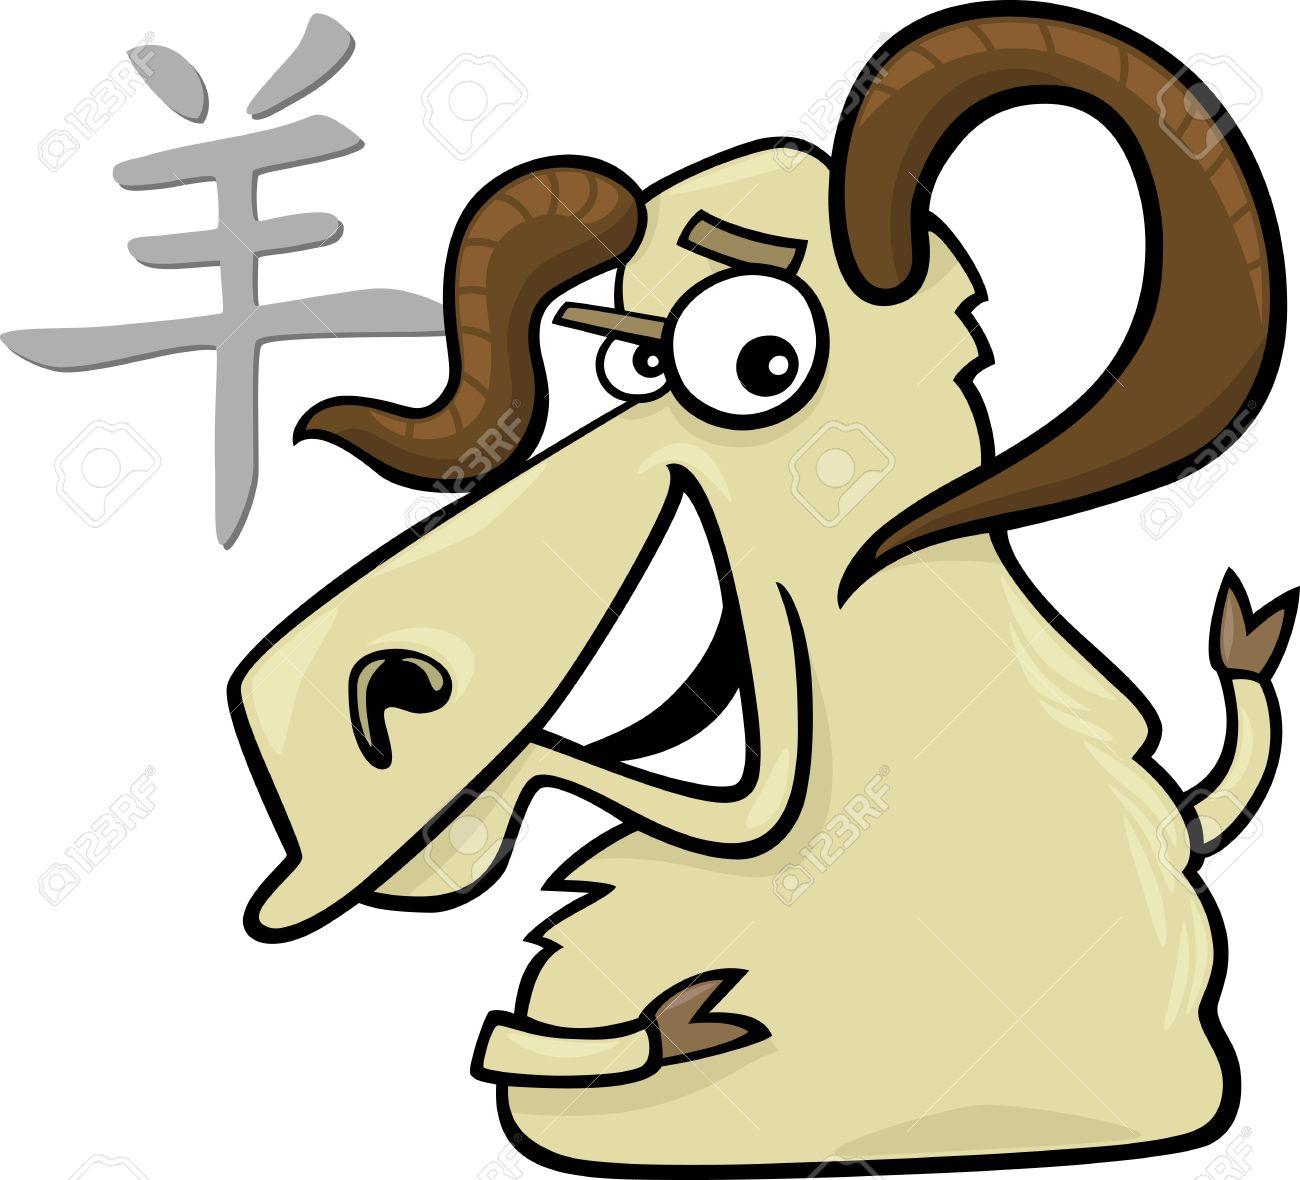 cartoon illustration of Goat or Ram Chinese horoscope sign Stock Vector - 12938483